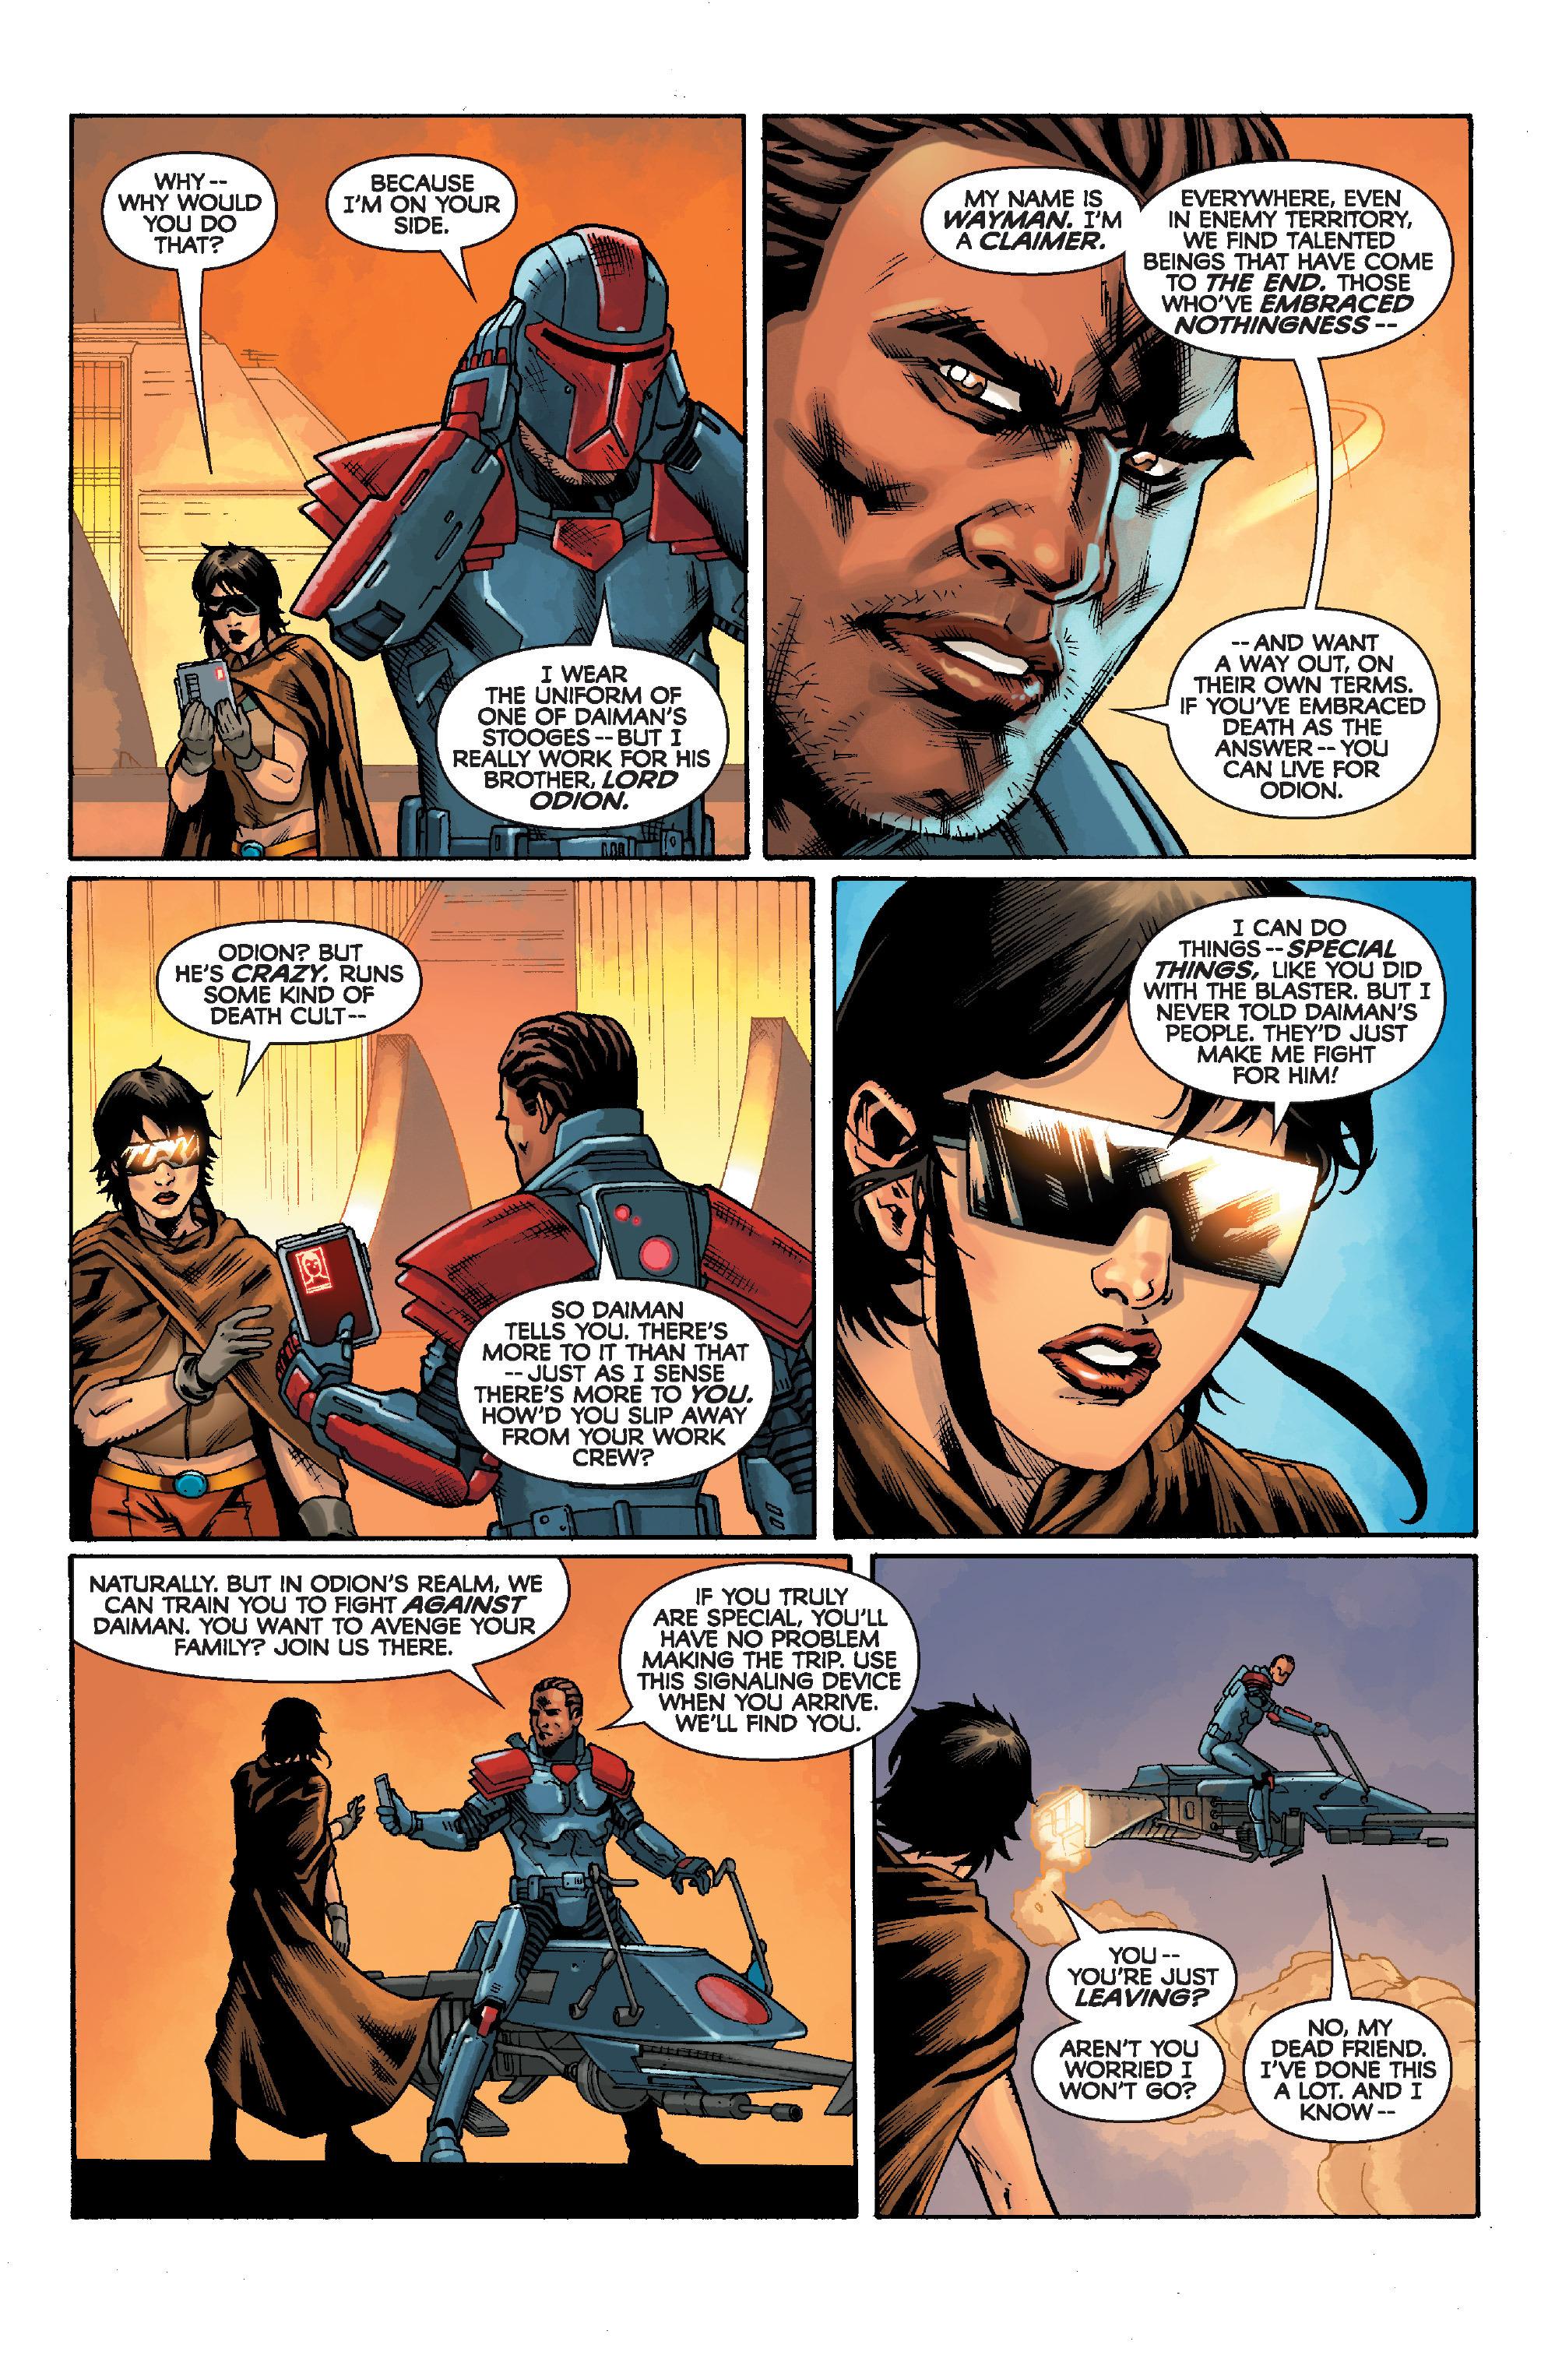 Read online Star Wars: Knight Errant - Escape comic -  Issue #1 - 7